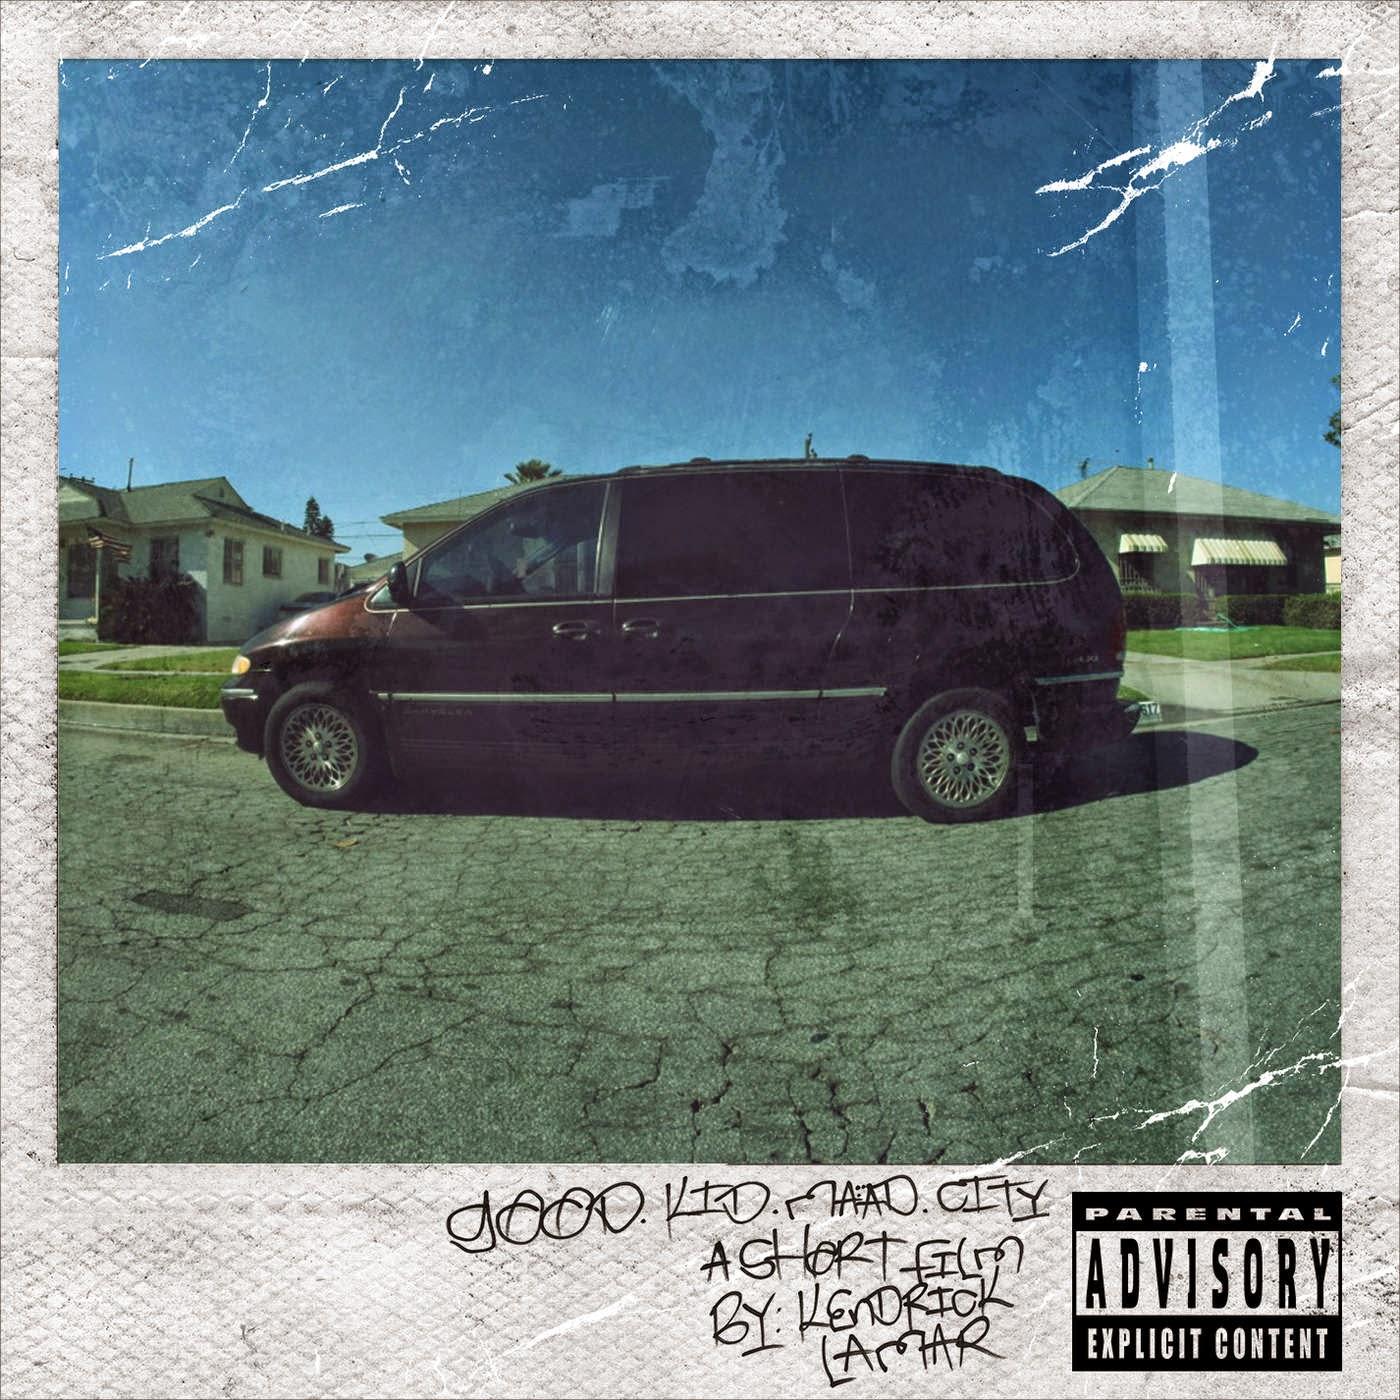 Kendrick Lamar - County Building Blues - Single Cover